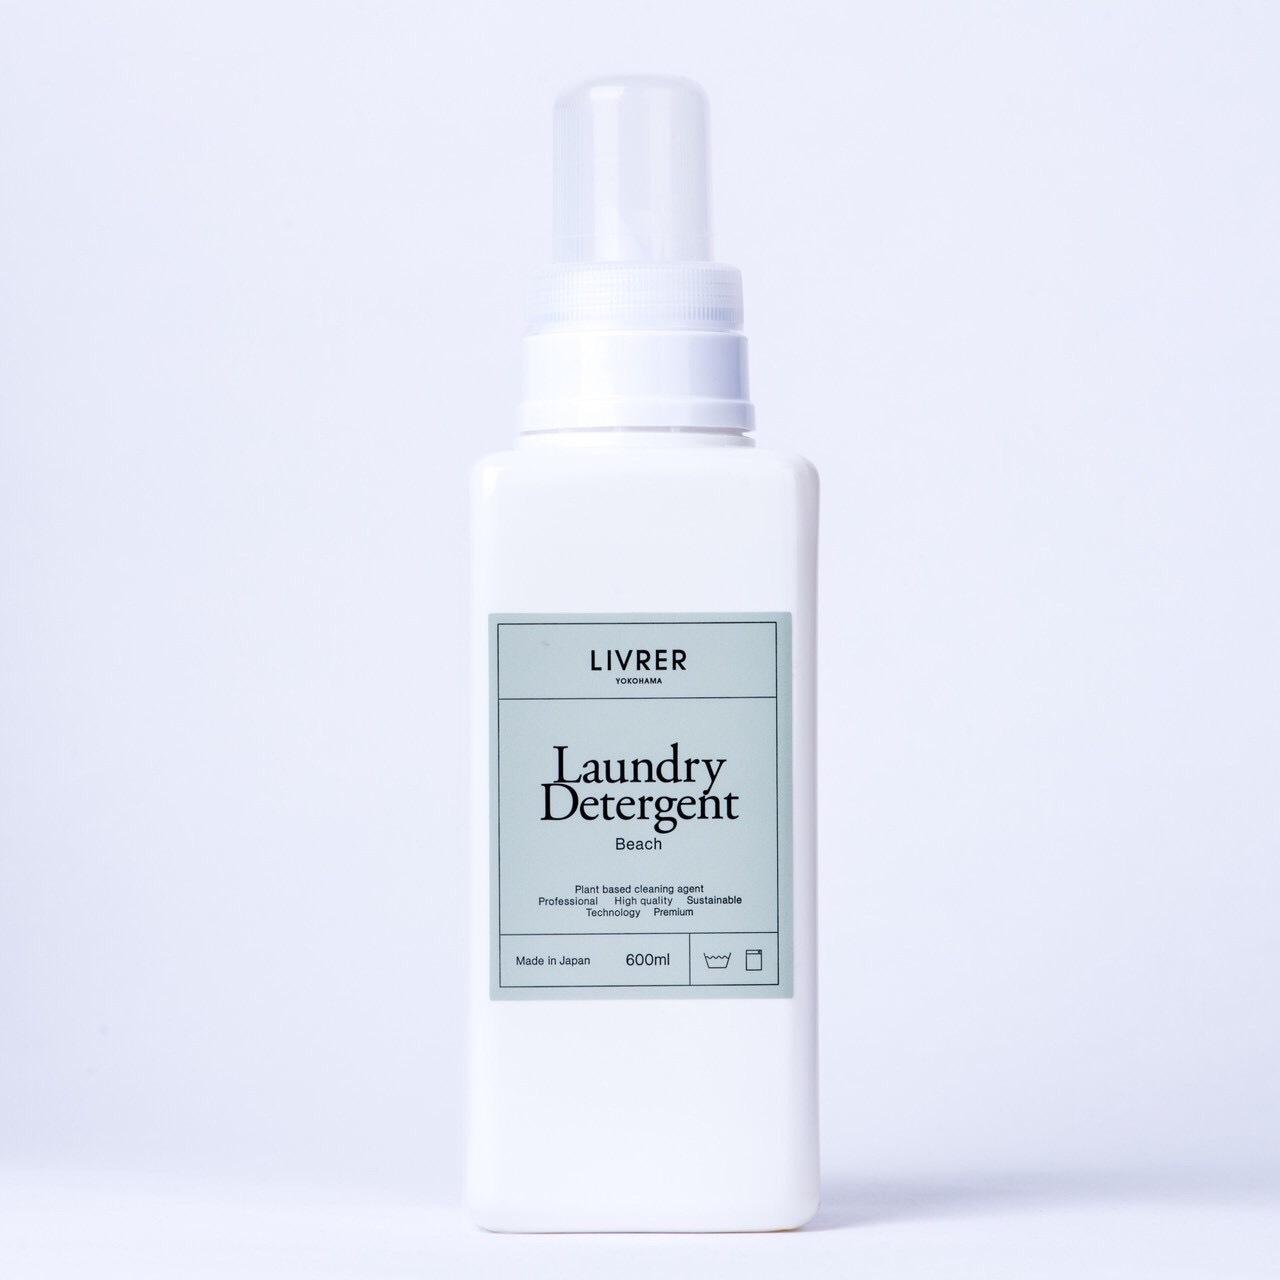 600ml】ビーチ 洗濯用洗剤 /Landry Detergent ▶Beach <綿、麻、合成繊維用>